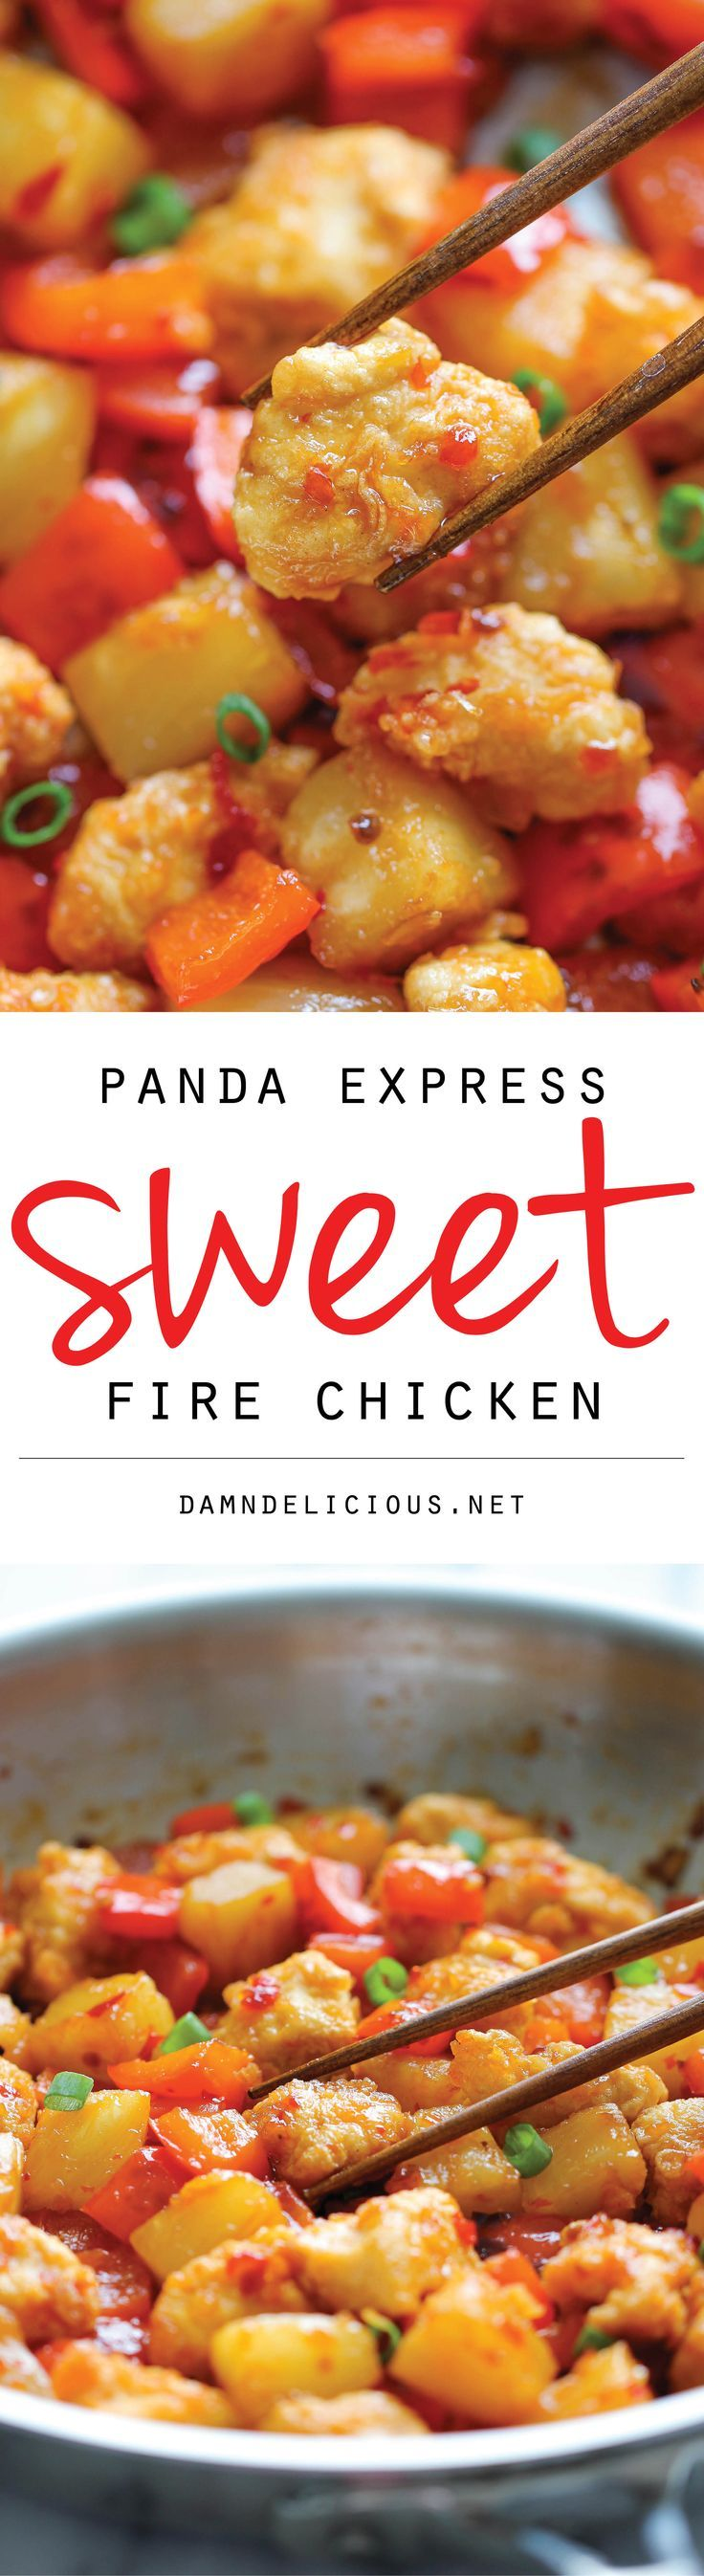 Panda Express Sweet Fire Chicken Copycat - An easy homemade version that tastes…